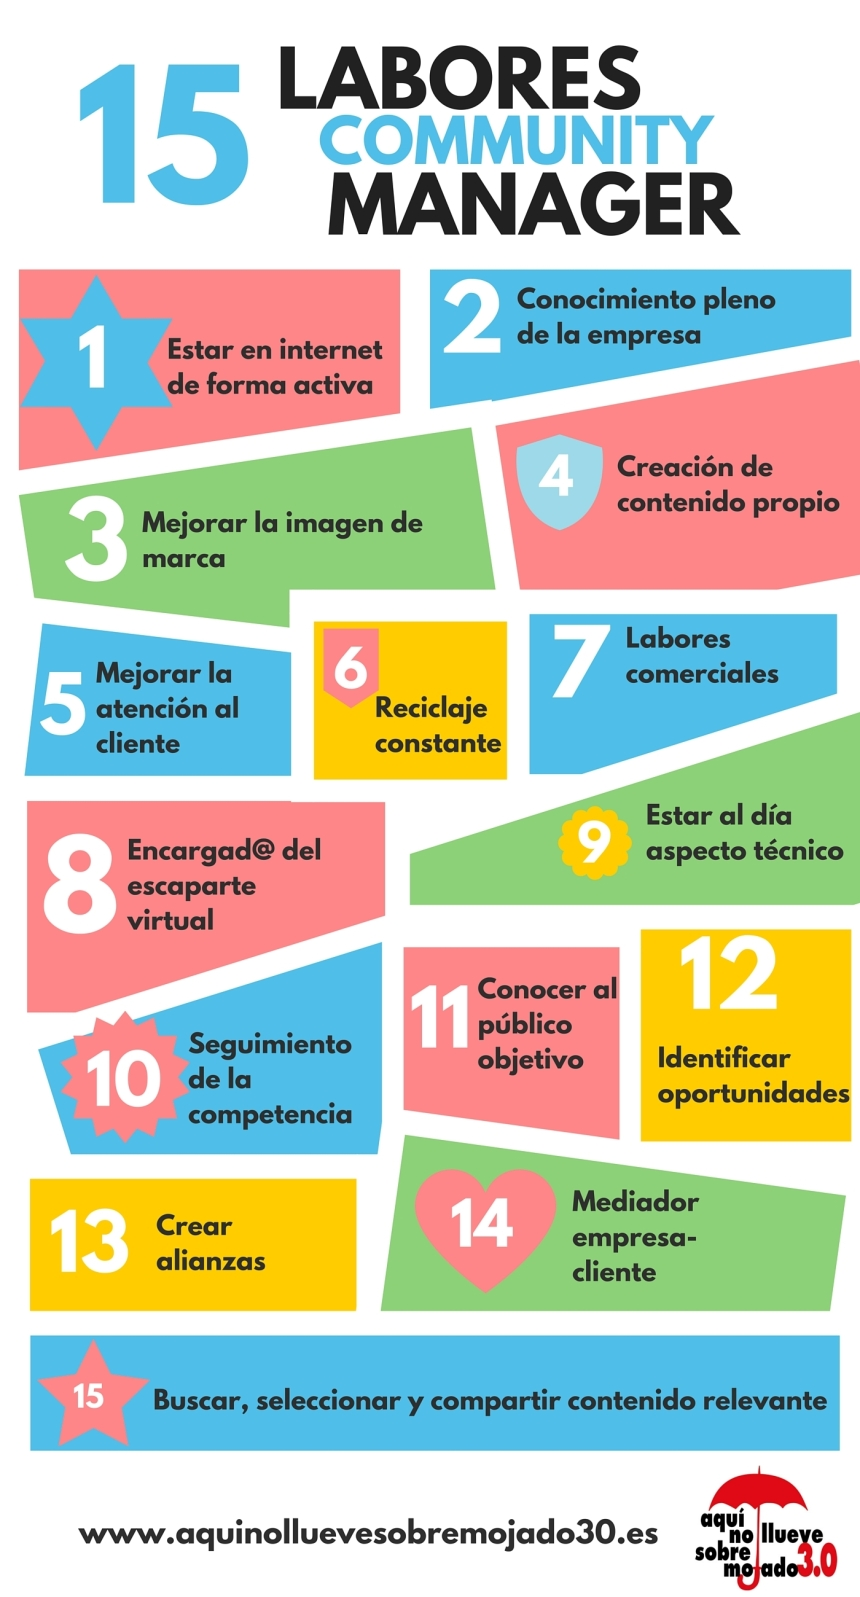 15 tareas de un Community Manager